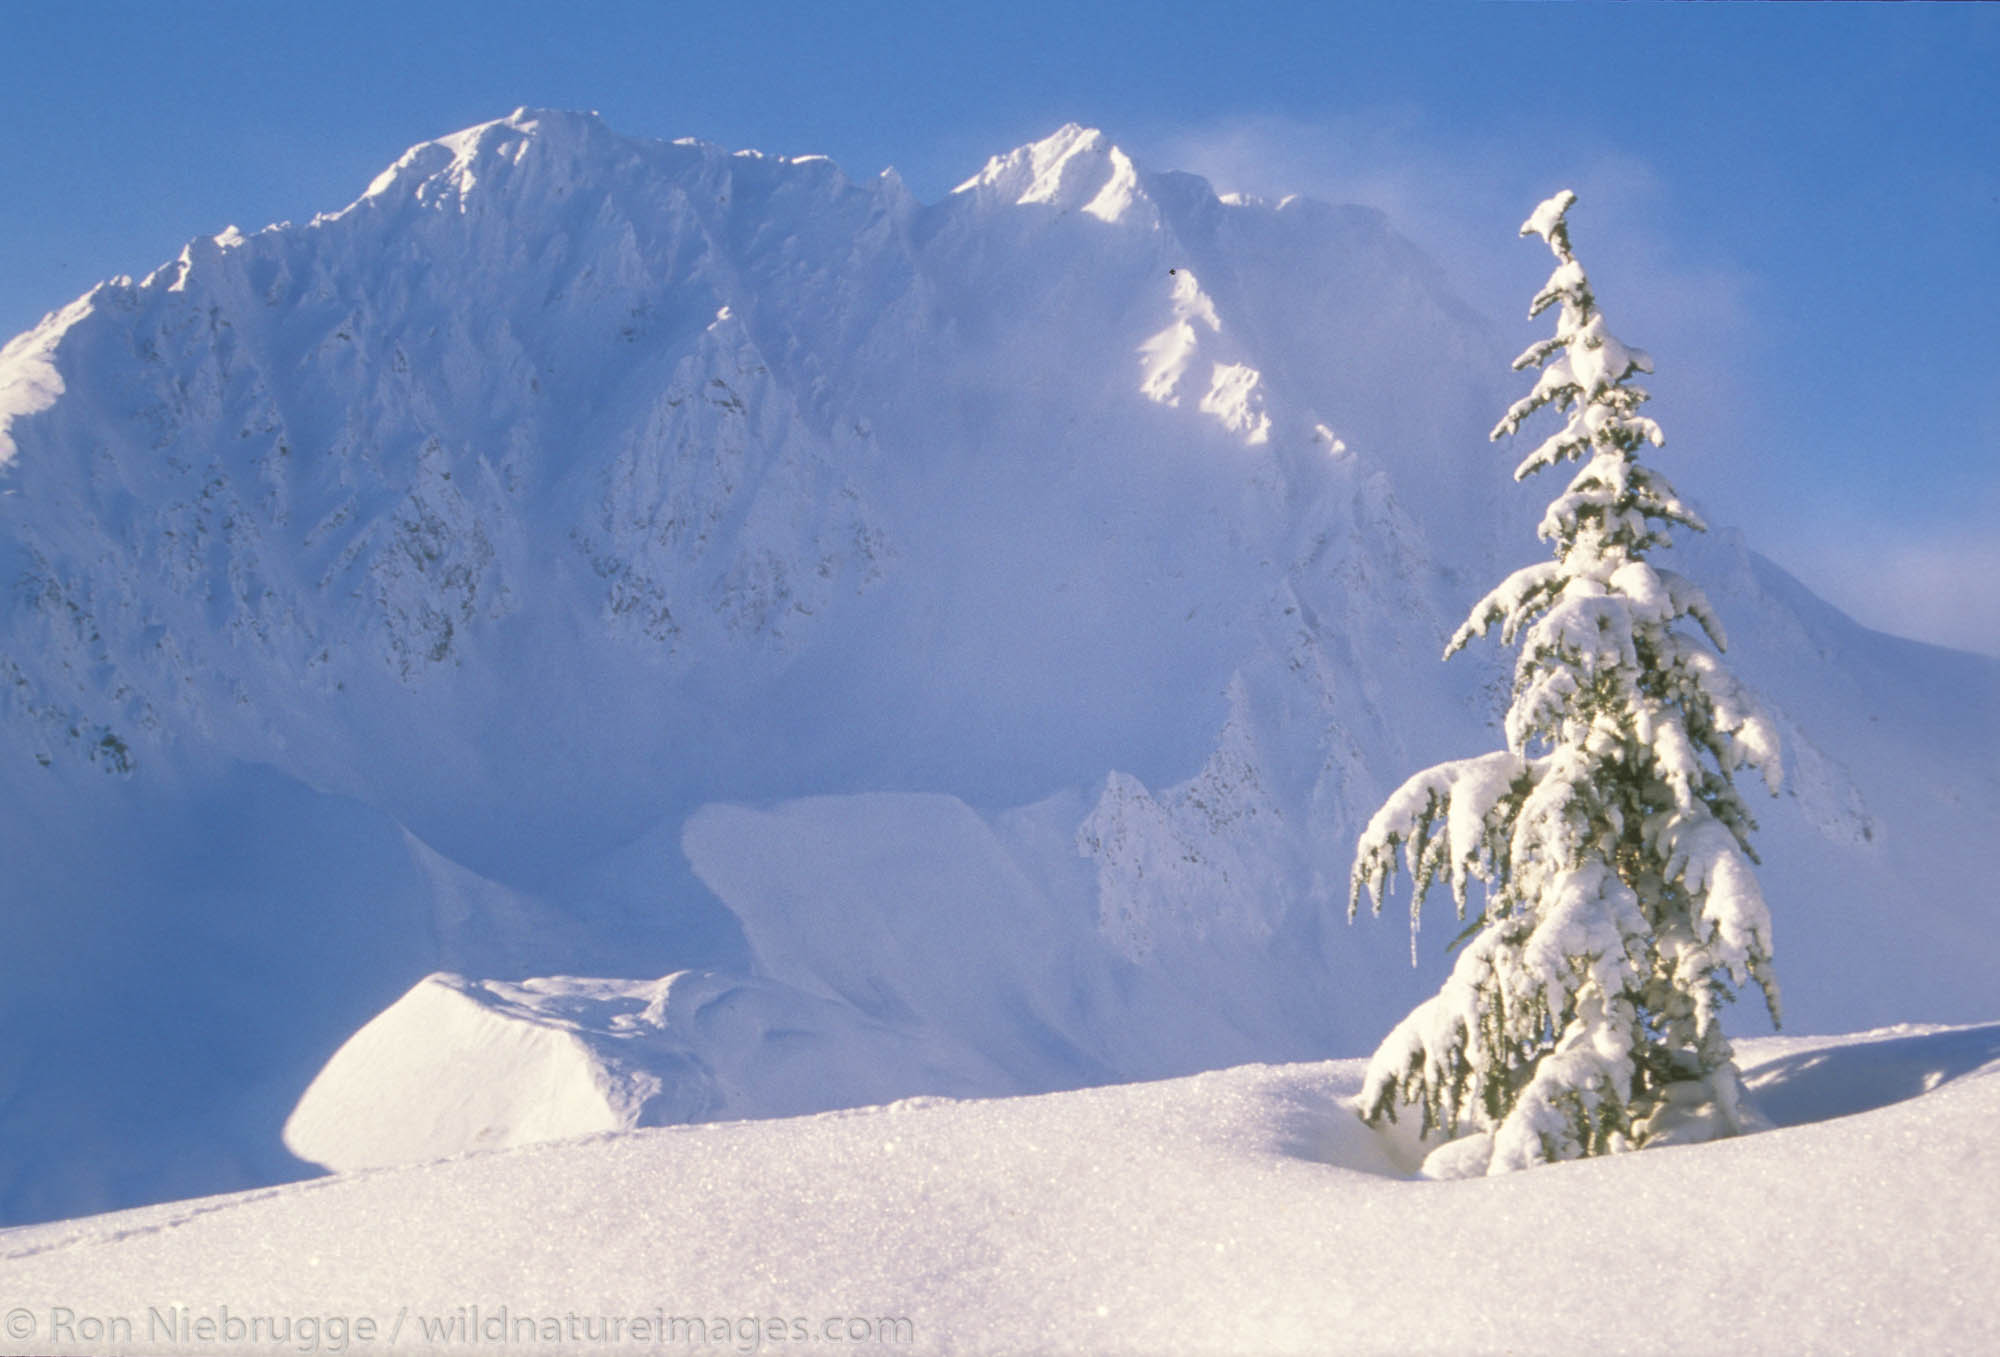 A small tree during winter in the Chugach National Forest, near Seward, Alaska.